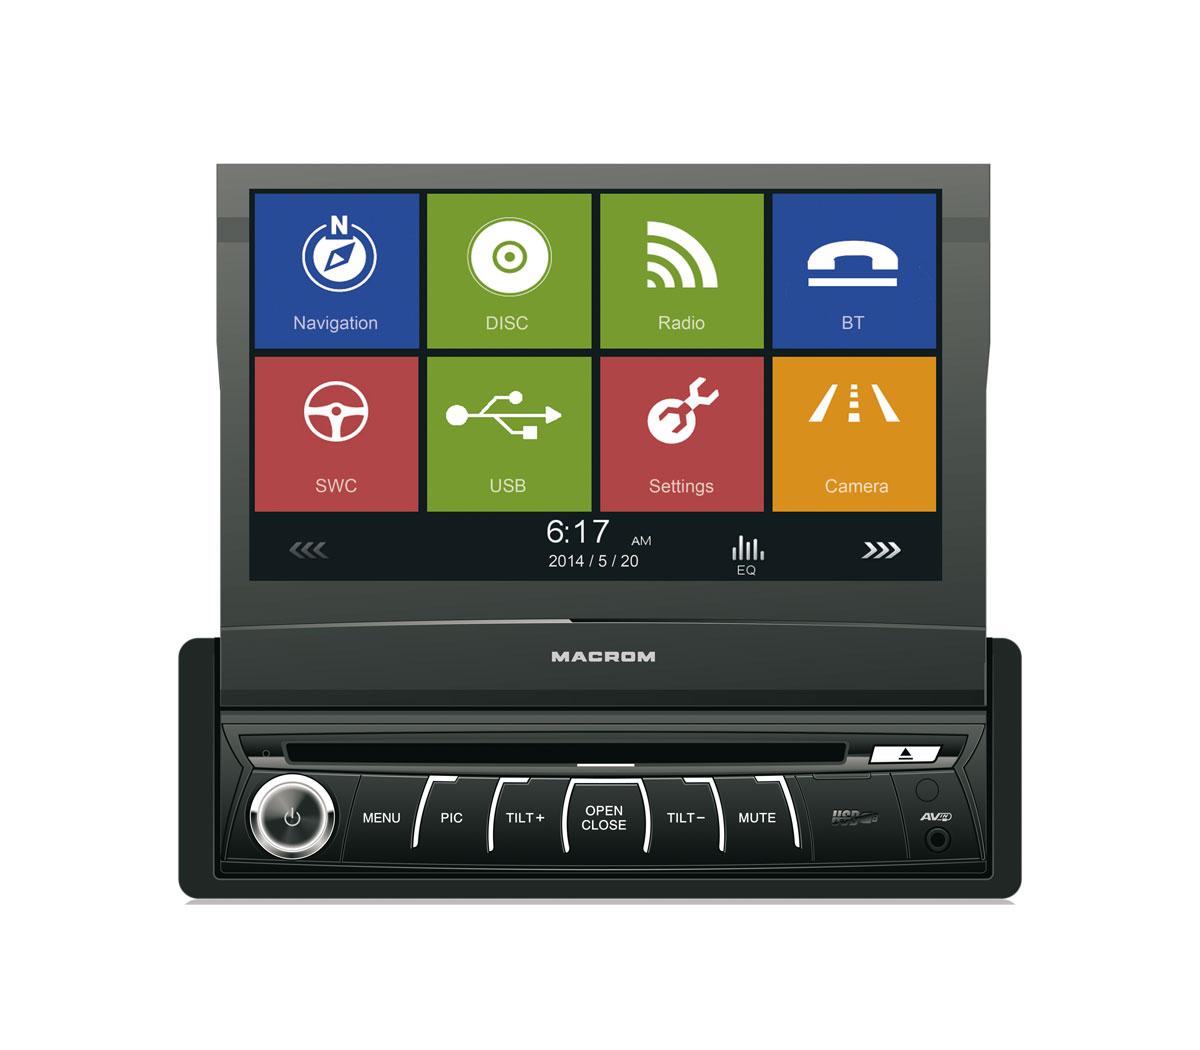 GPS autor�dio MACROM M-DVD6560 s HF sadou,1DIN-ov� v�suvn�